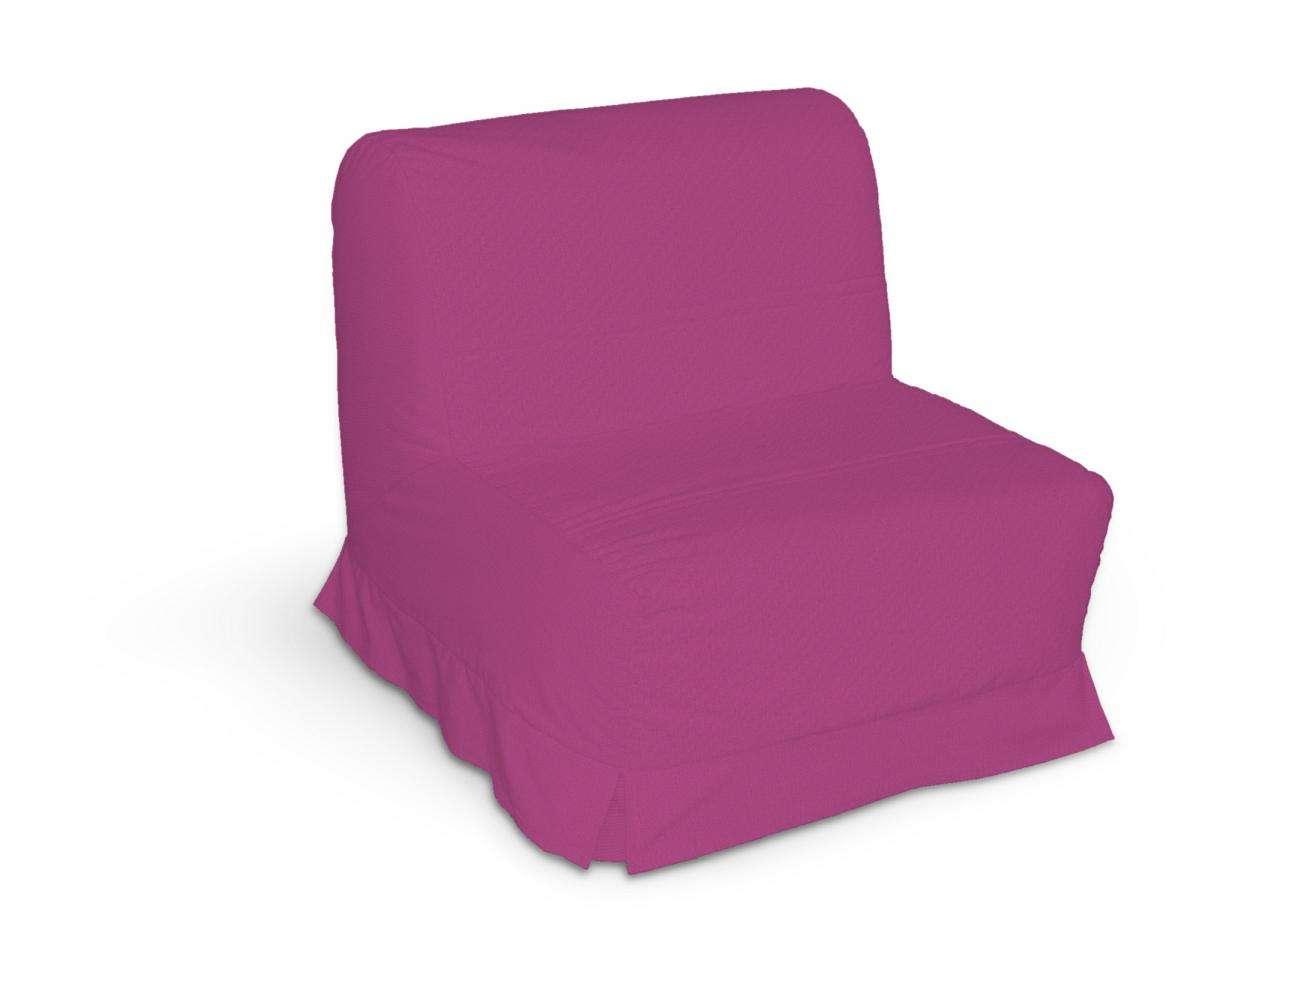 Lycksele Sesselbezug mit Kellerfalten Lycksele von der Kollektion Etna, Stoff: 705-23